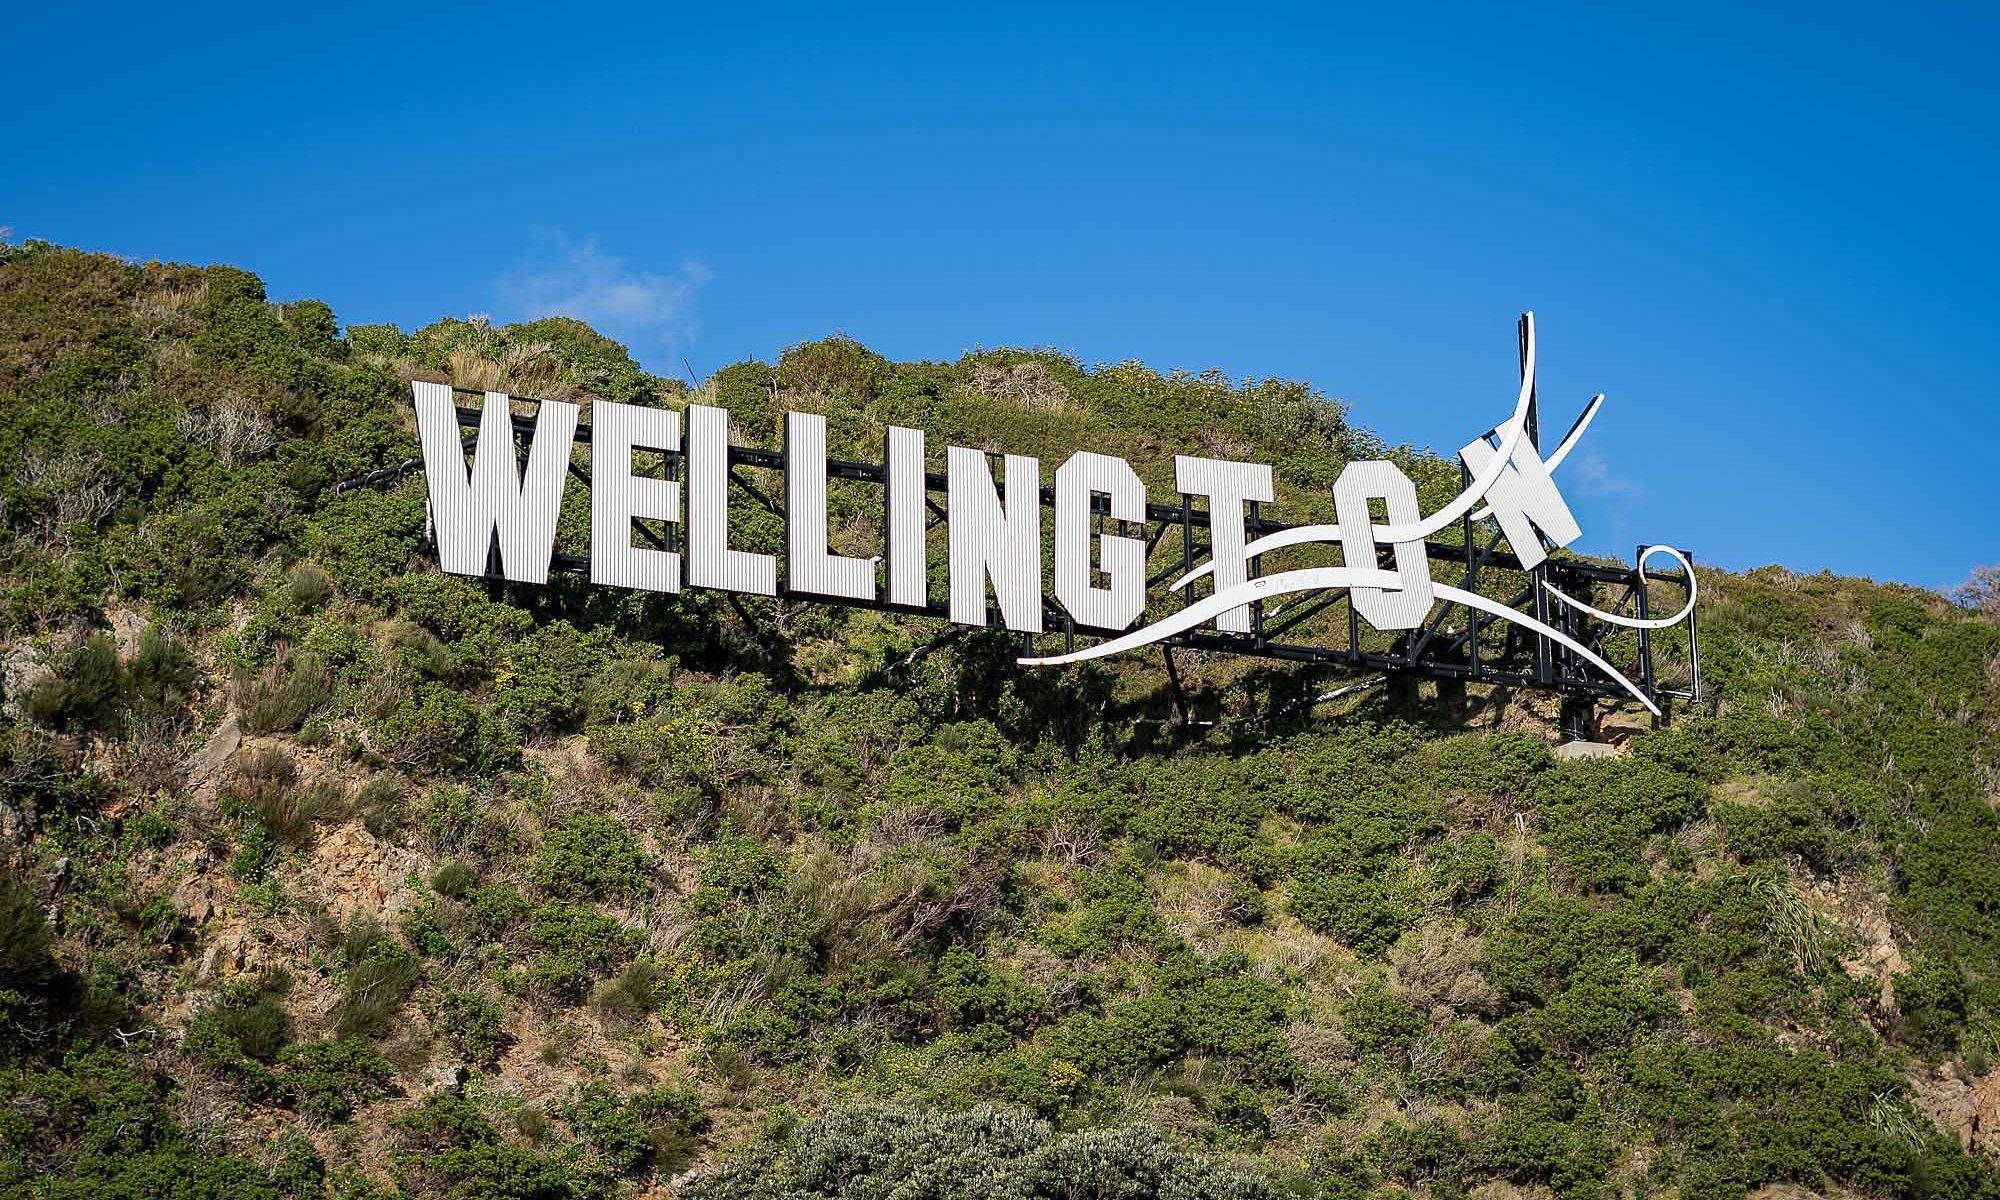 Windy Wellington sign